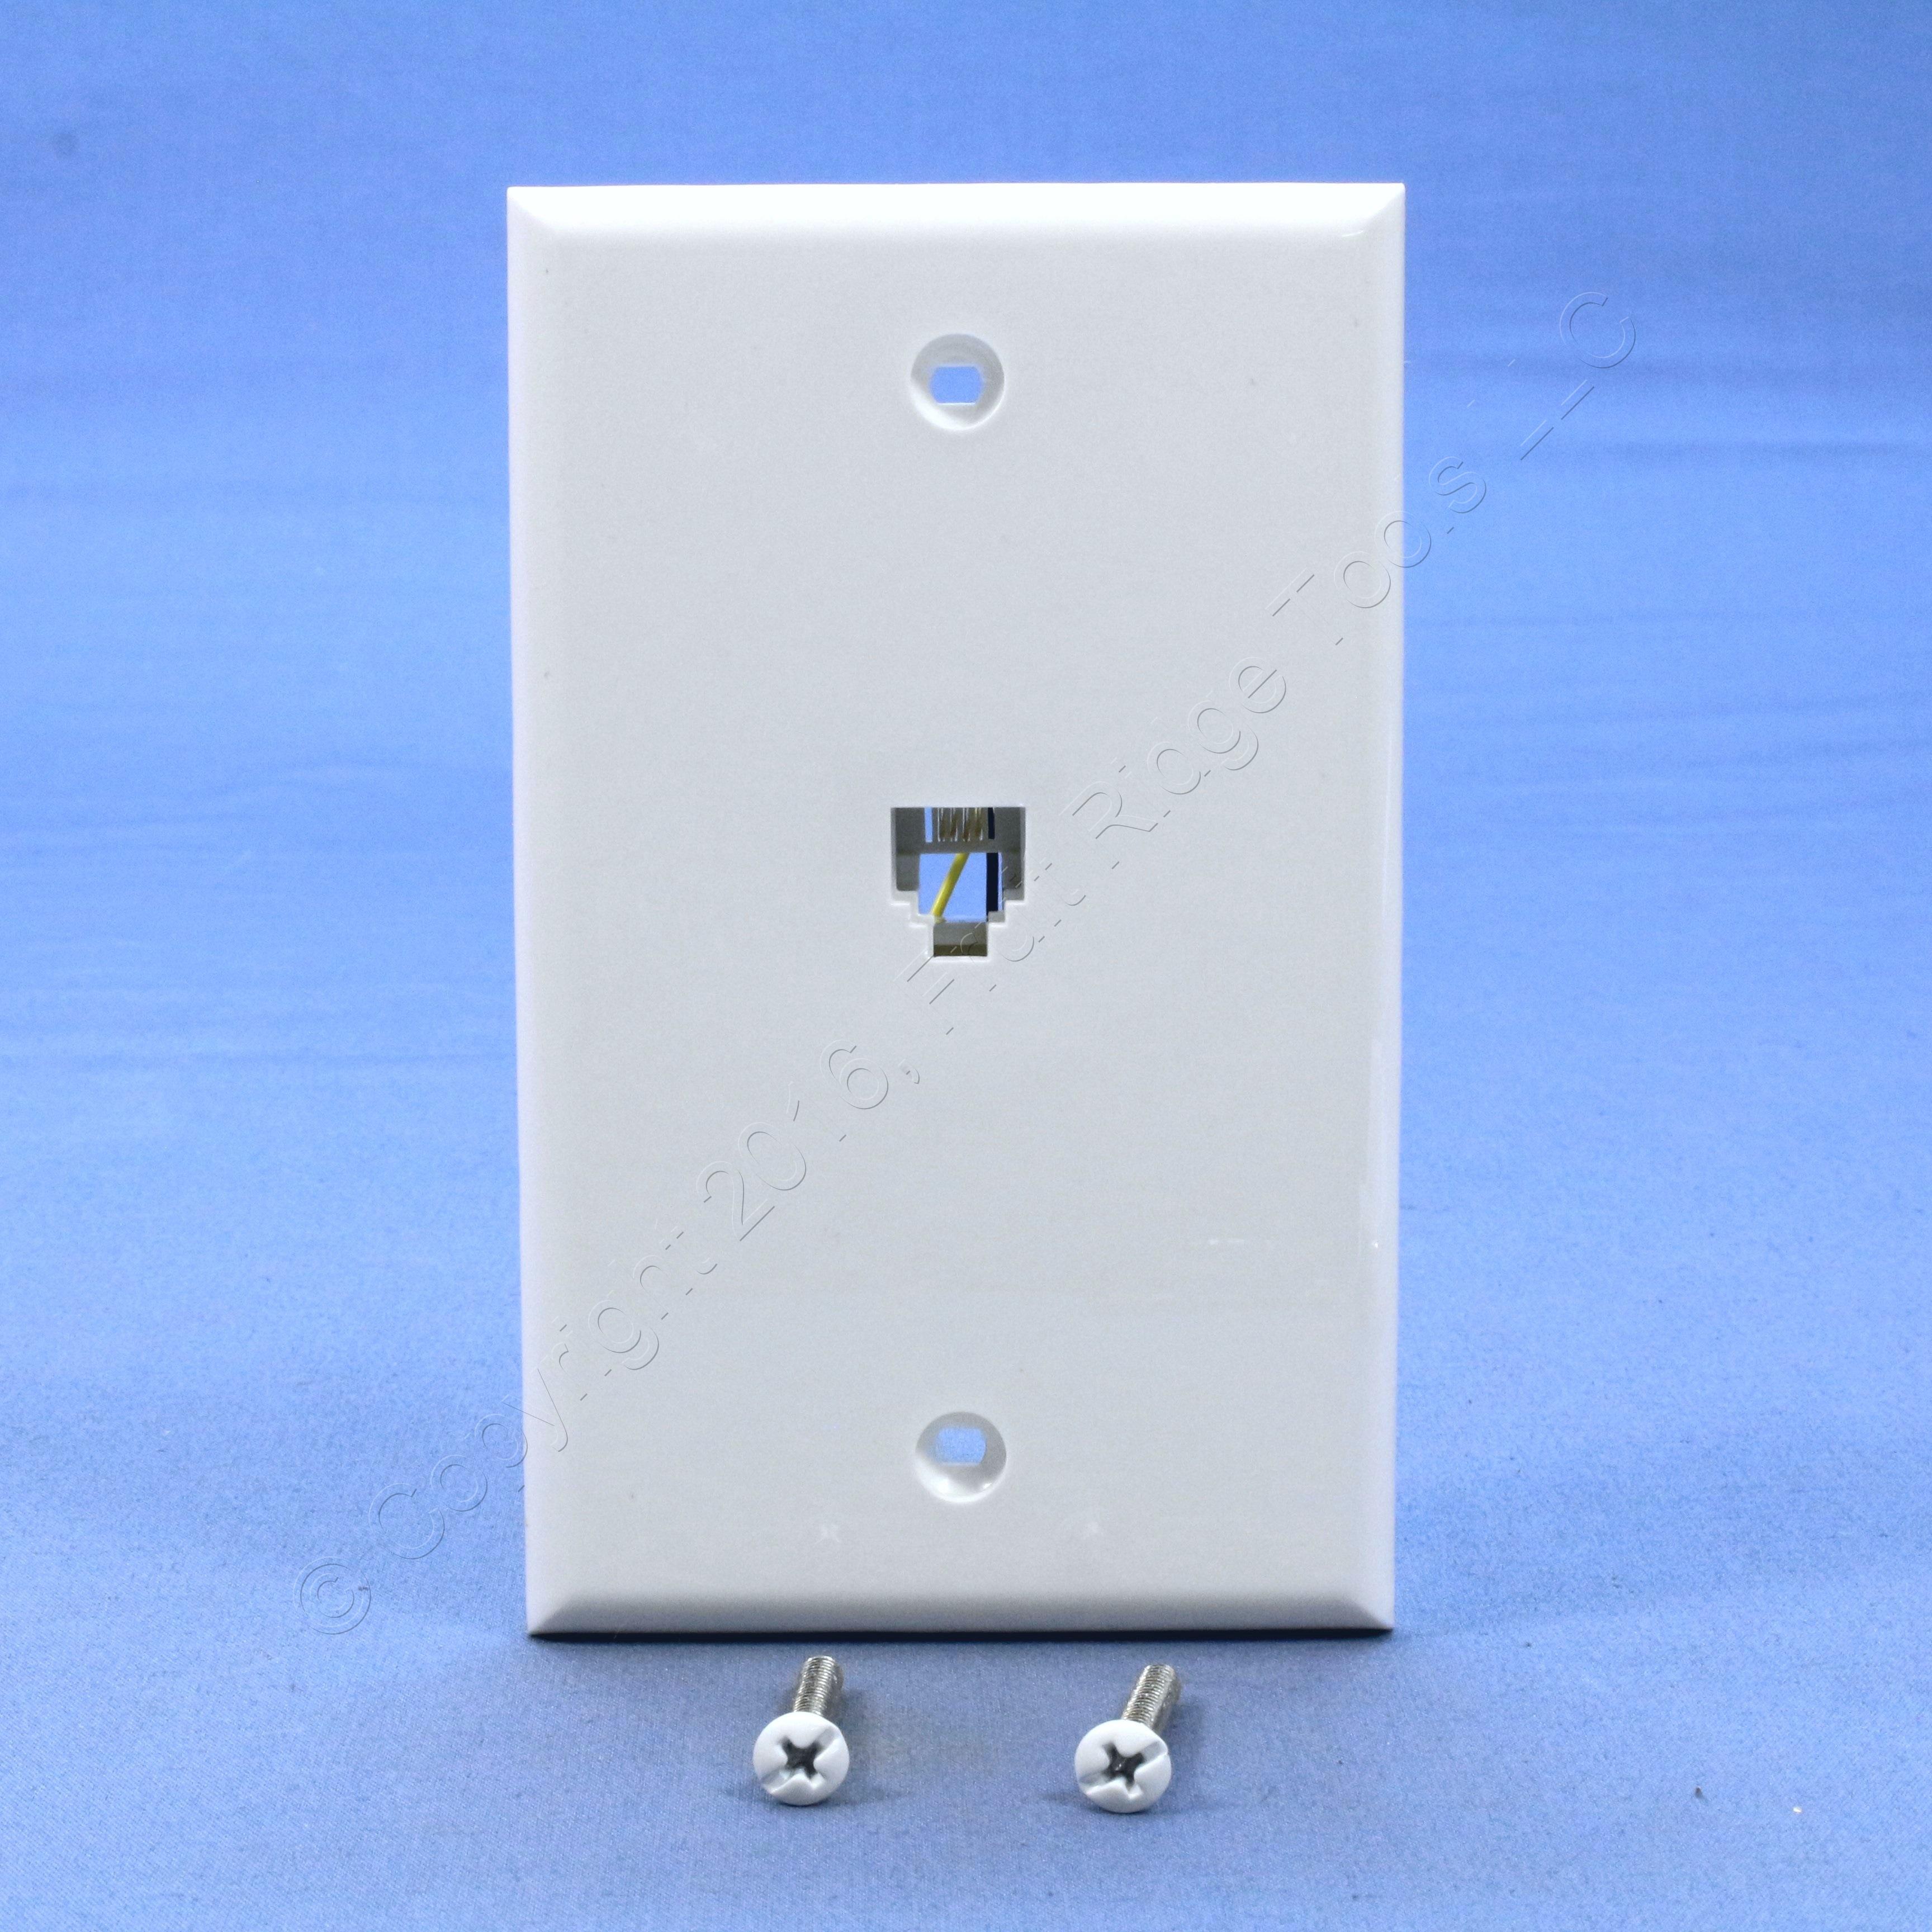 leviton white 4 wire type 625b4 jack wallplate rj11. Black Bedroom Furniture Sets. Home Design Ideas